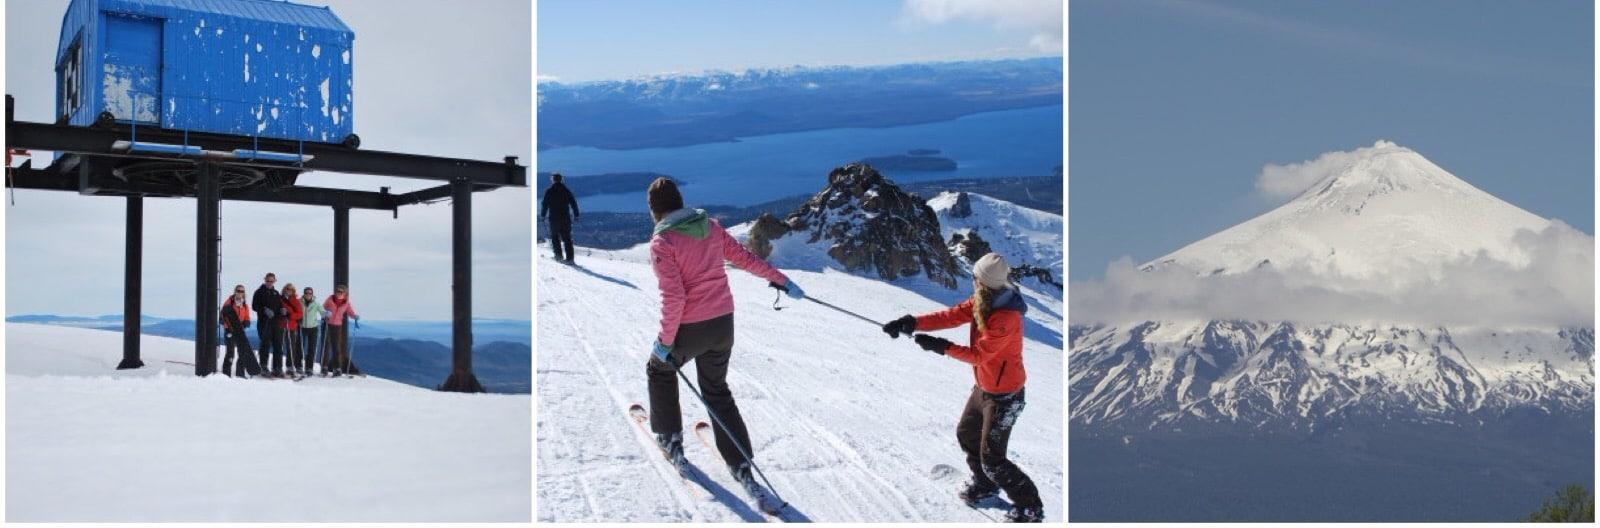 Mooiste skigebieden ter wereld